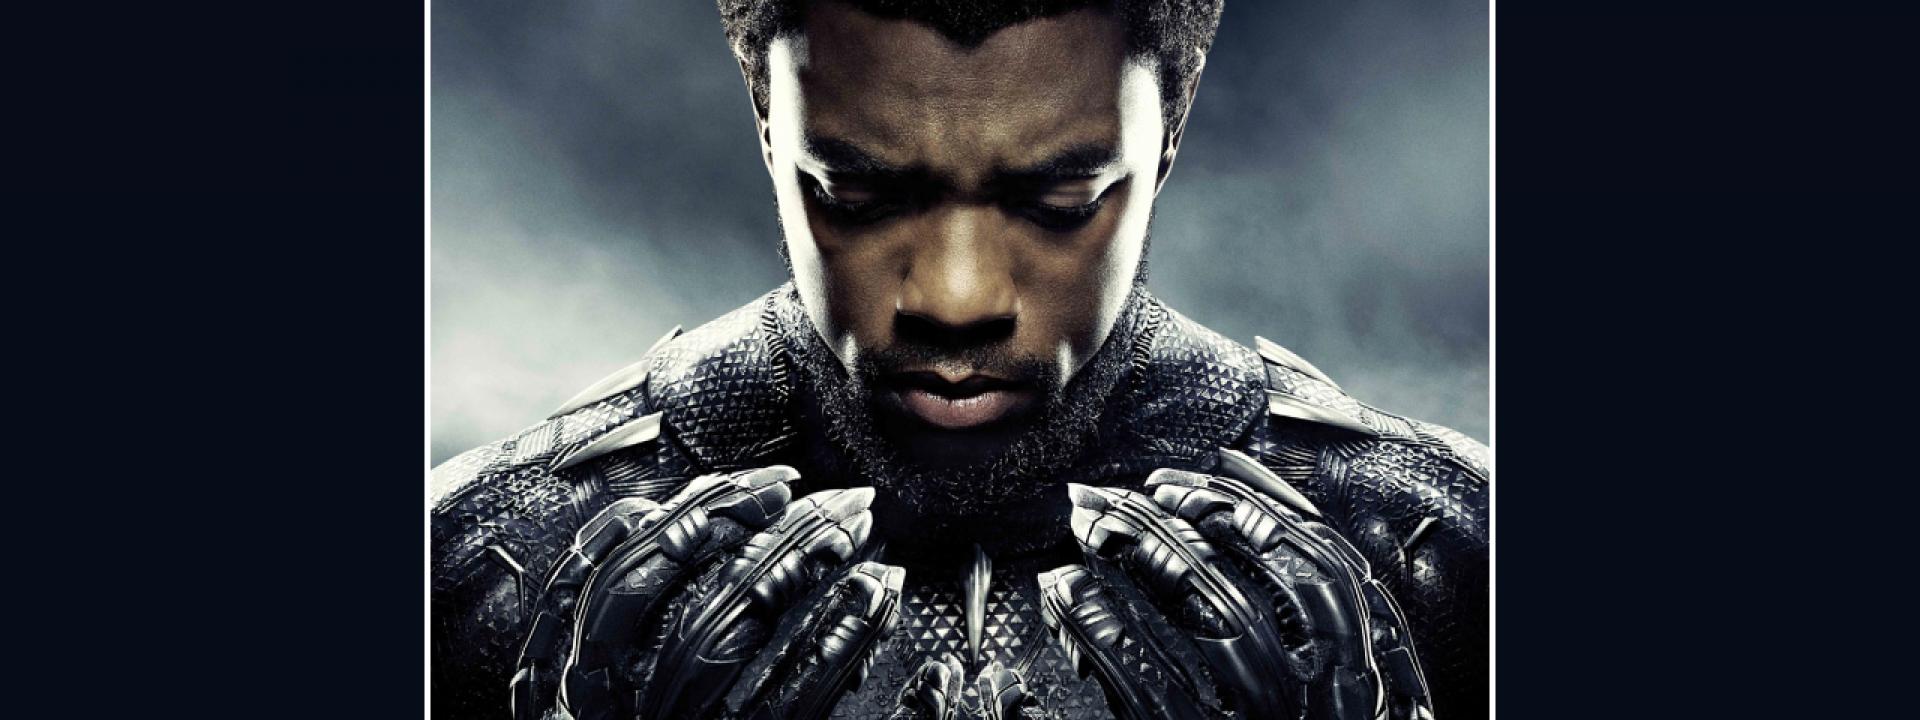 Park Your Cinema: Black Panther (2018) - Εικόνα